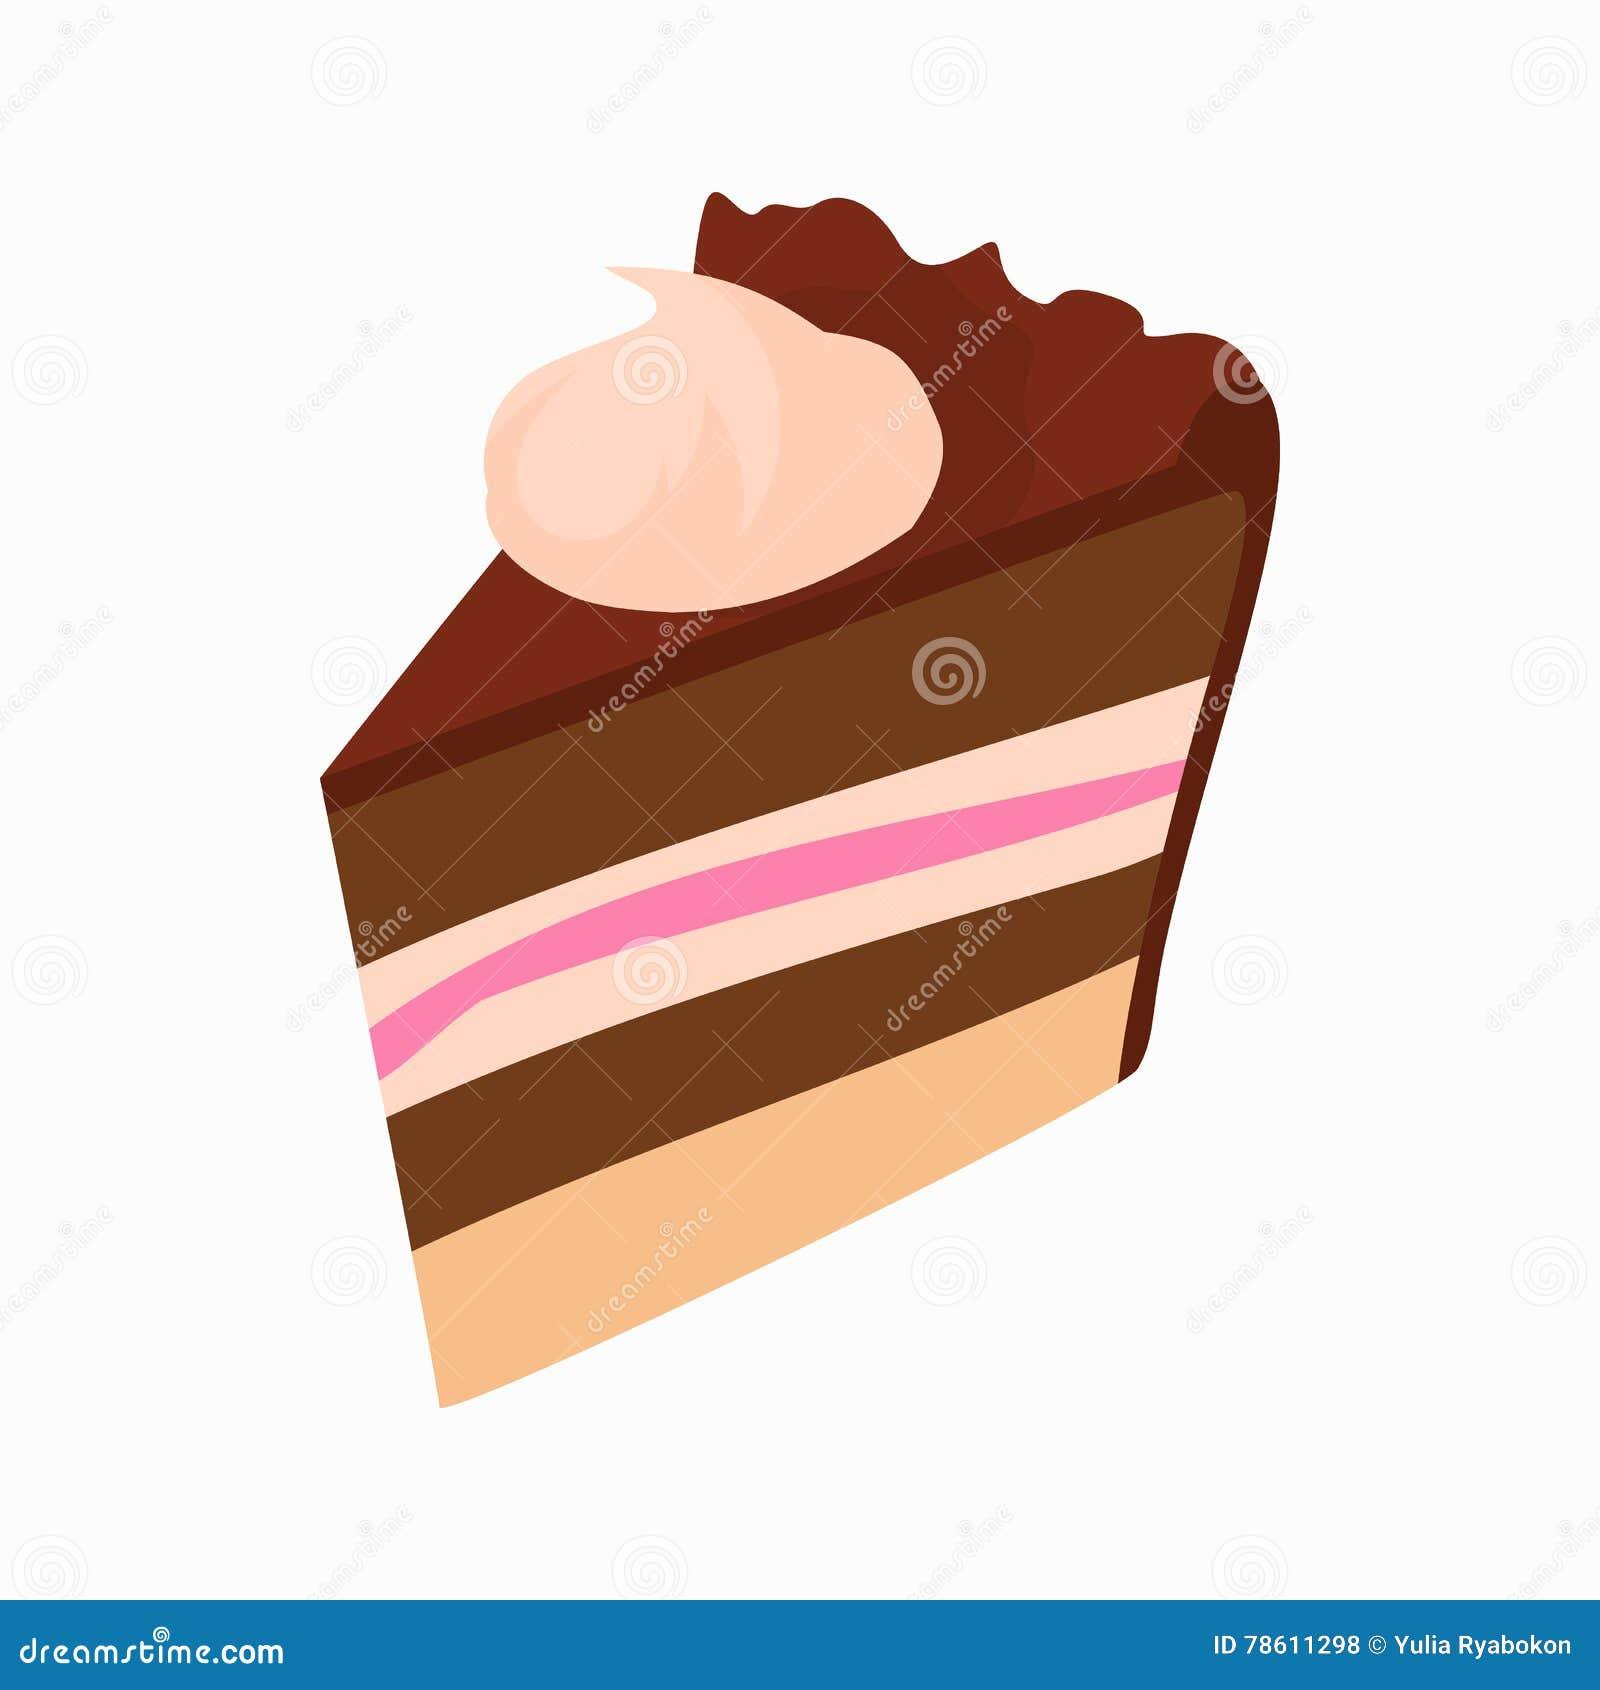 Cake Slice Cartoon Images : Chocolate Cake Slice Icon, Cartoon Style Stock Vector ...